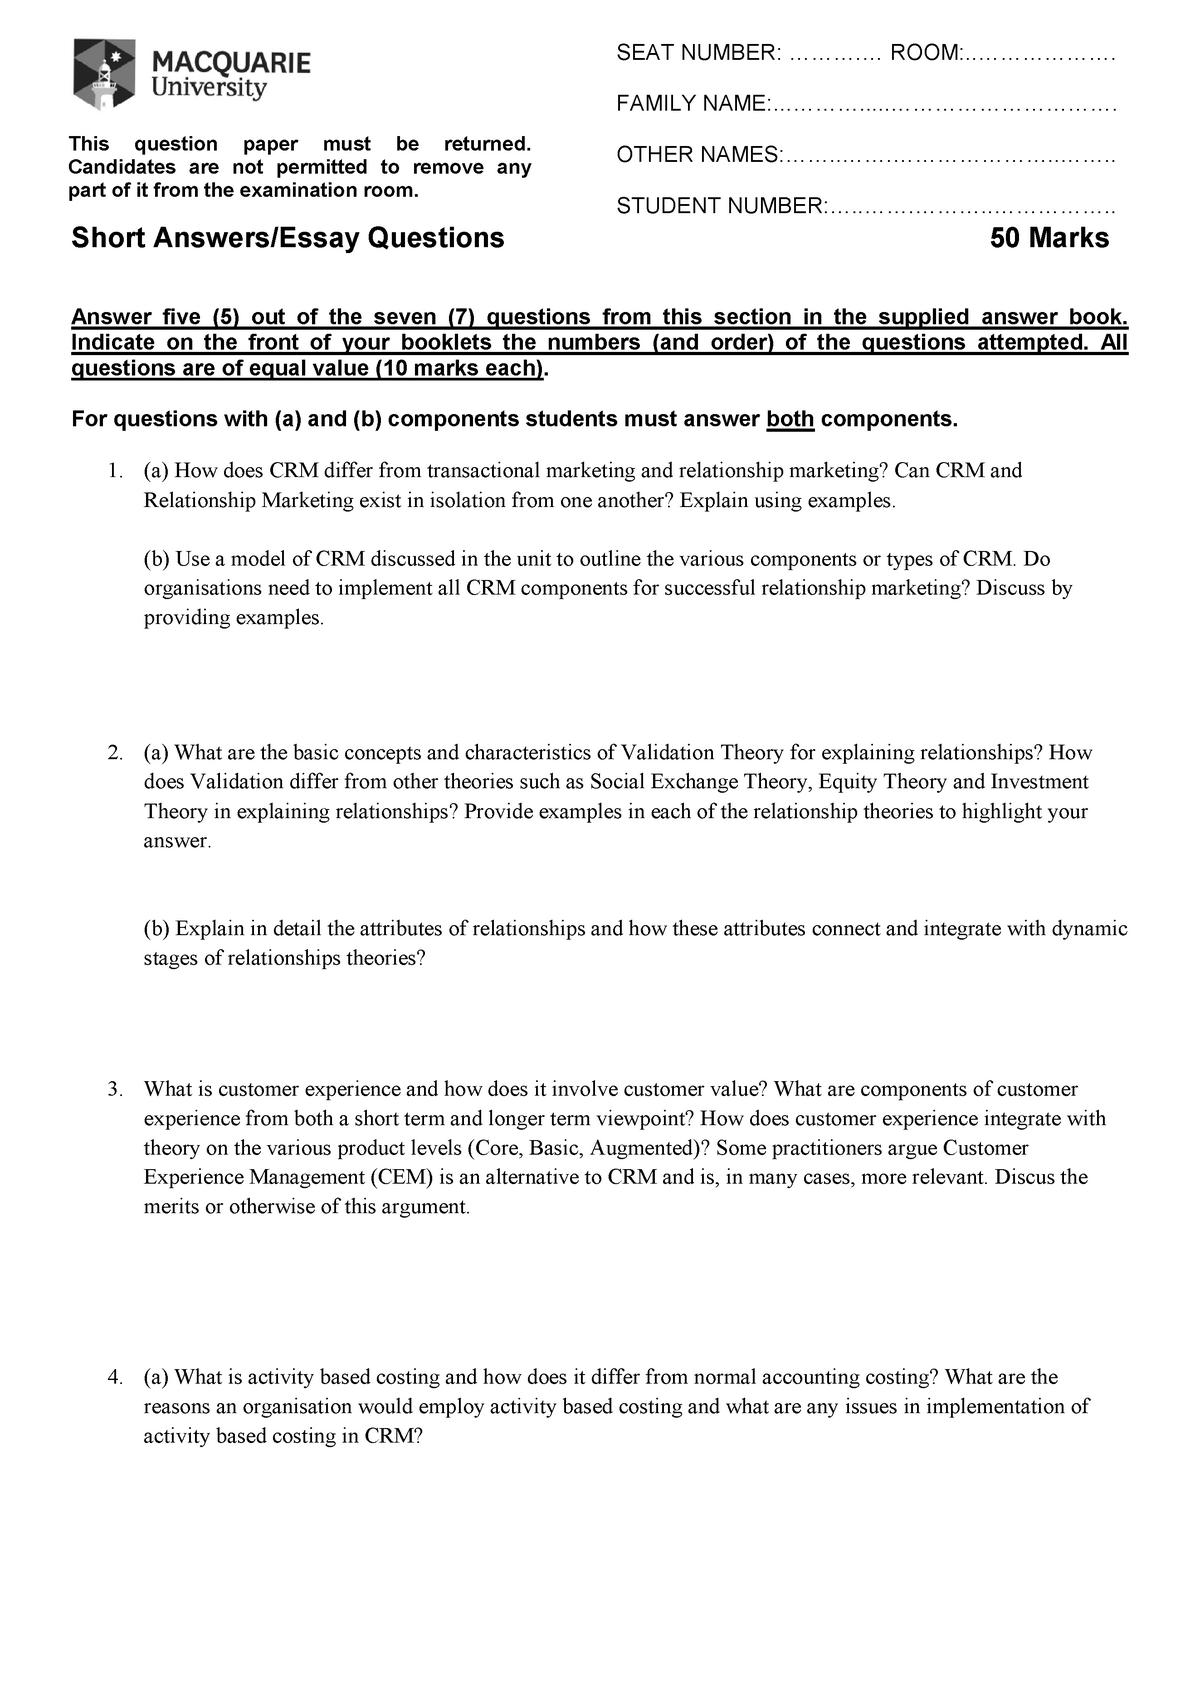 Final exam 2015, questions and answers - MKTG207 - MQ - StuDocu